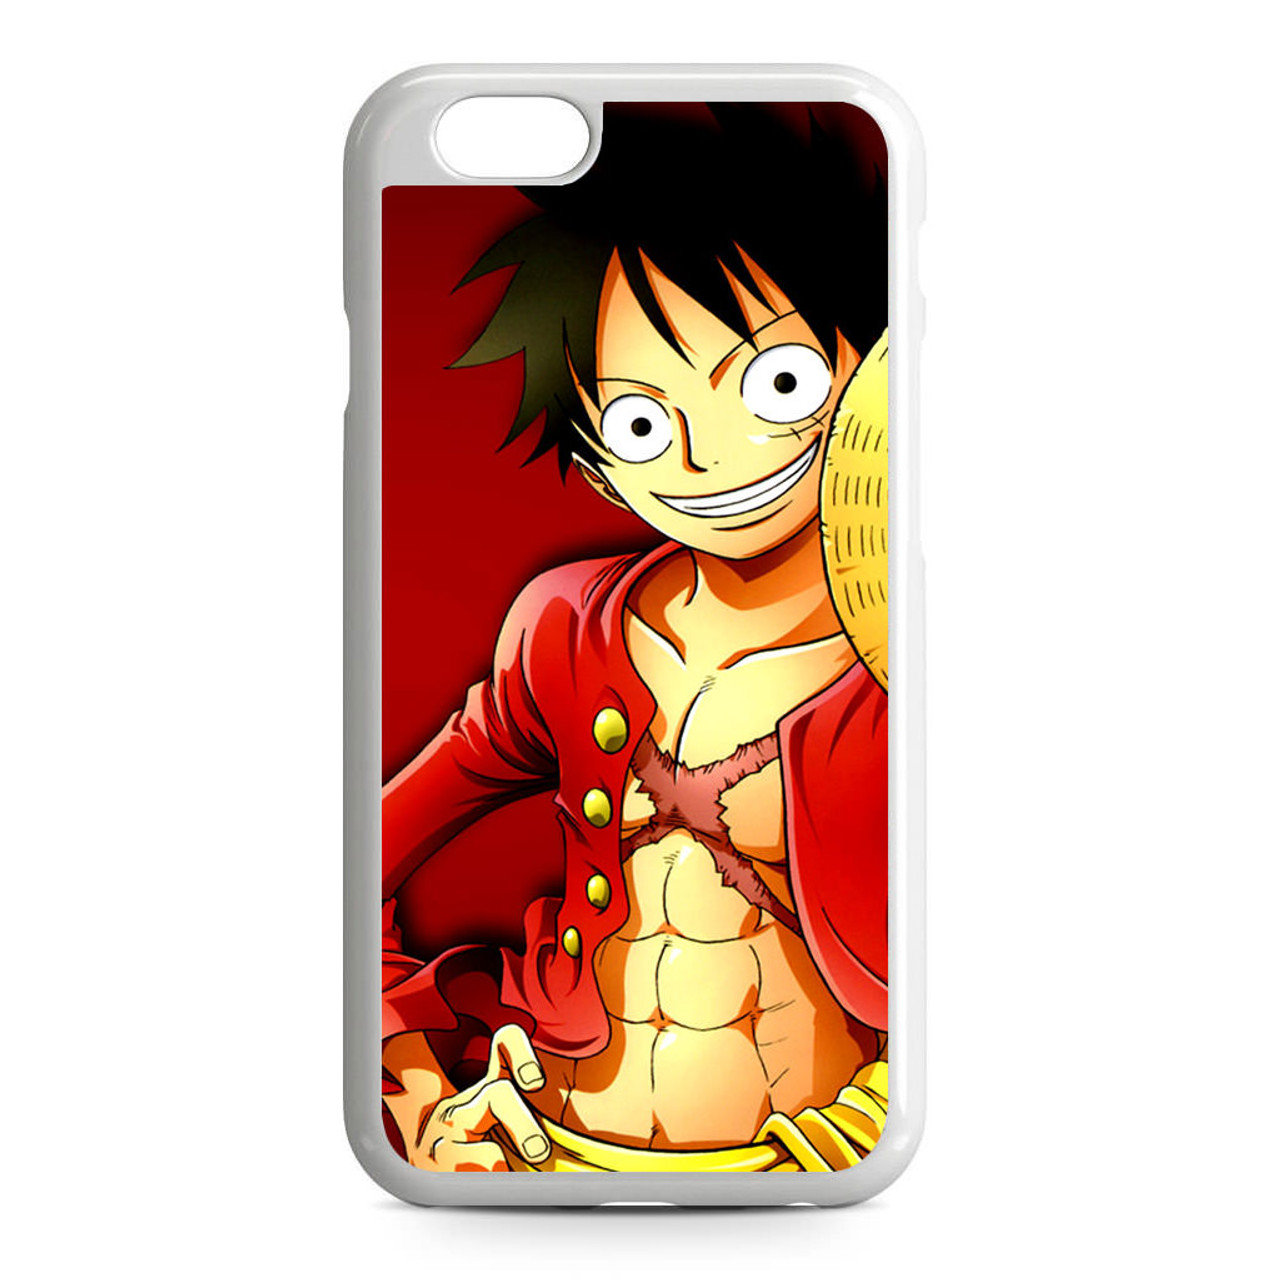 One Piece Luffy iPhone 6/6S Case